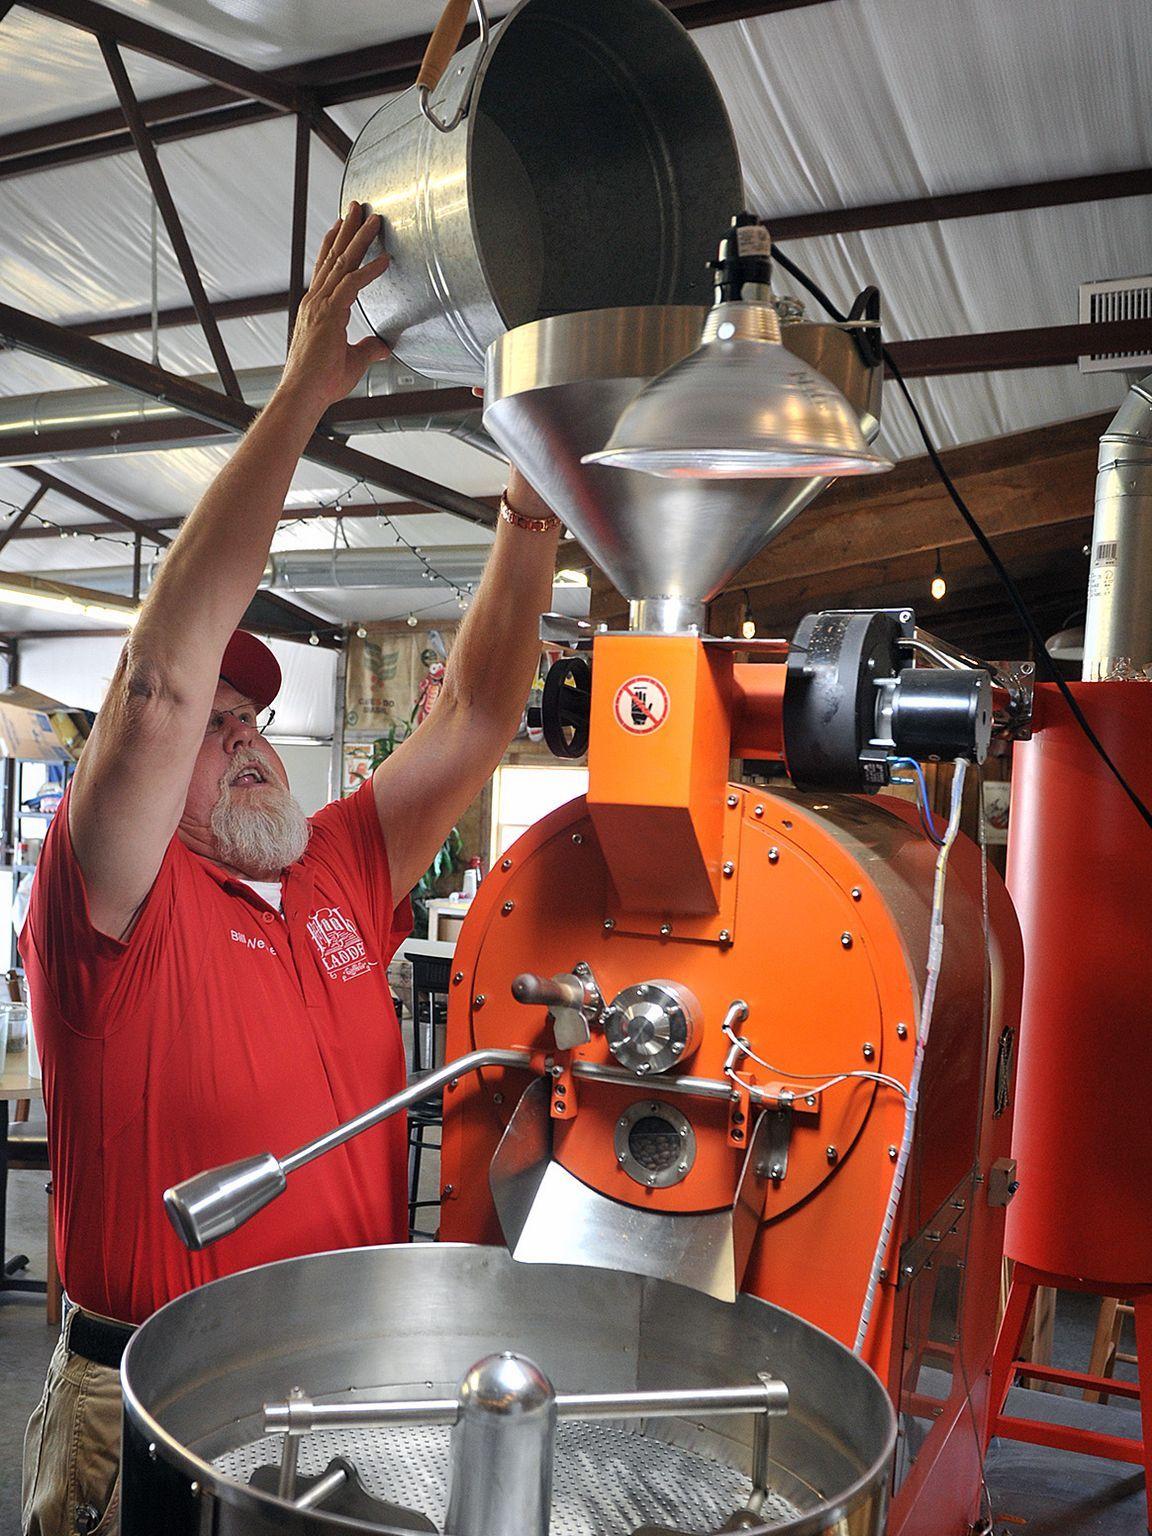 Roasted Coffee Beans in Wichita Falls